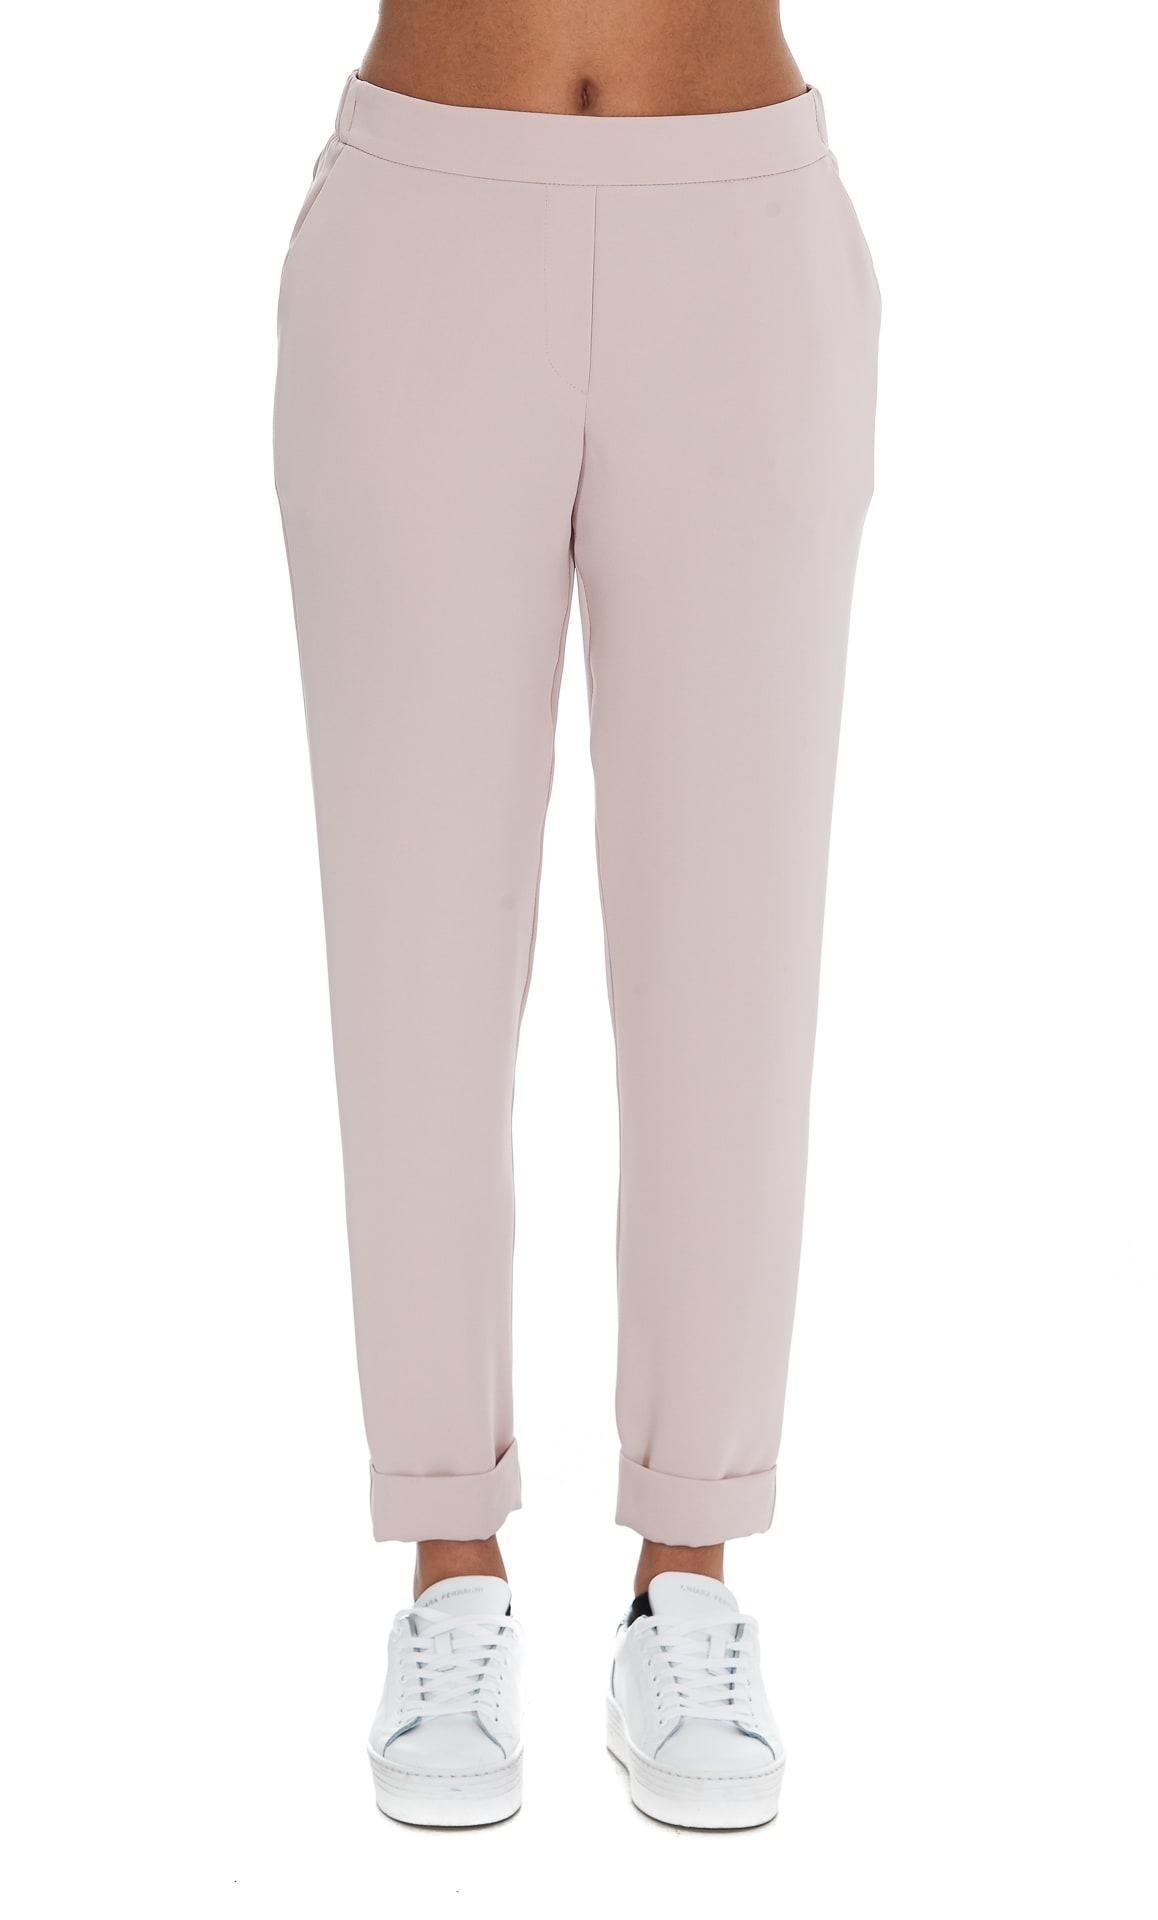 Parosh Panters Trousers